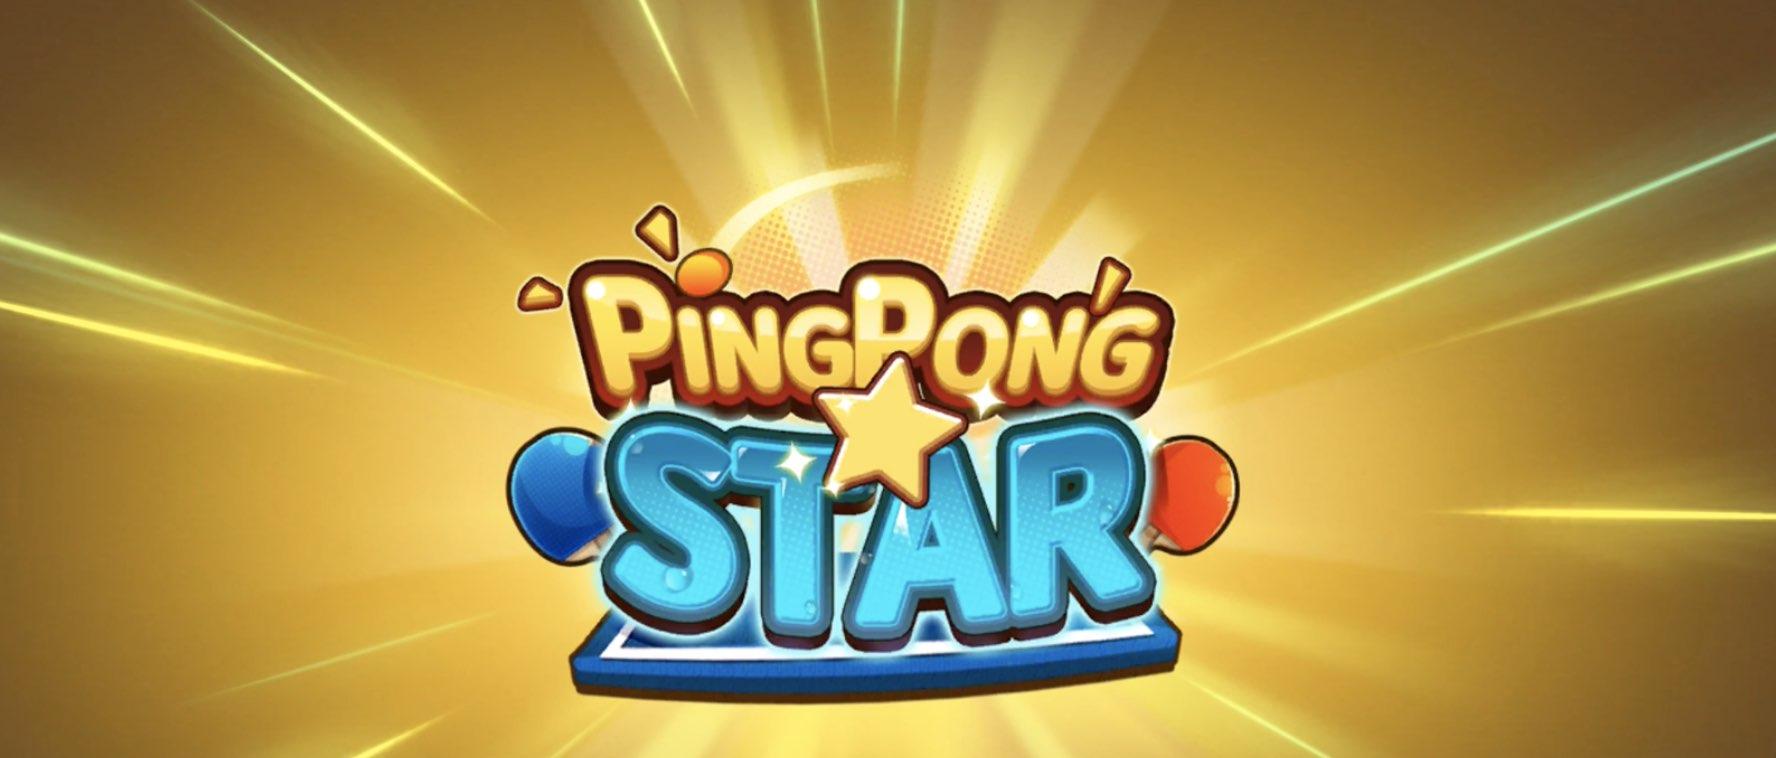 Ping Pong Star wiki